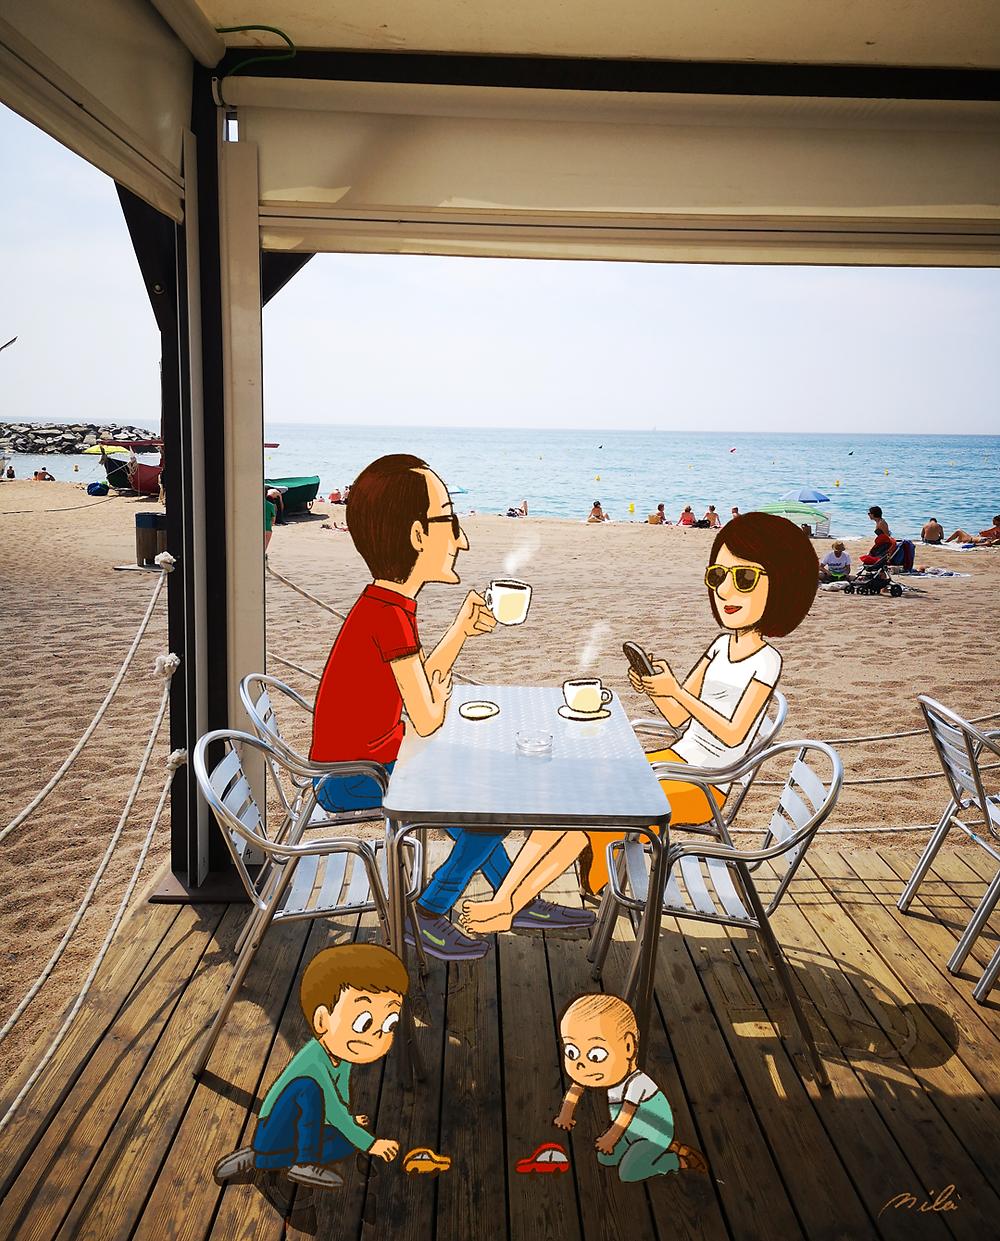 illustration, ipadpro, Barcelona, drawing, procreate, artjournal, art, doodle, sketchbook, santpoldemar, maresme, family, xiringuito, xiringo